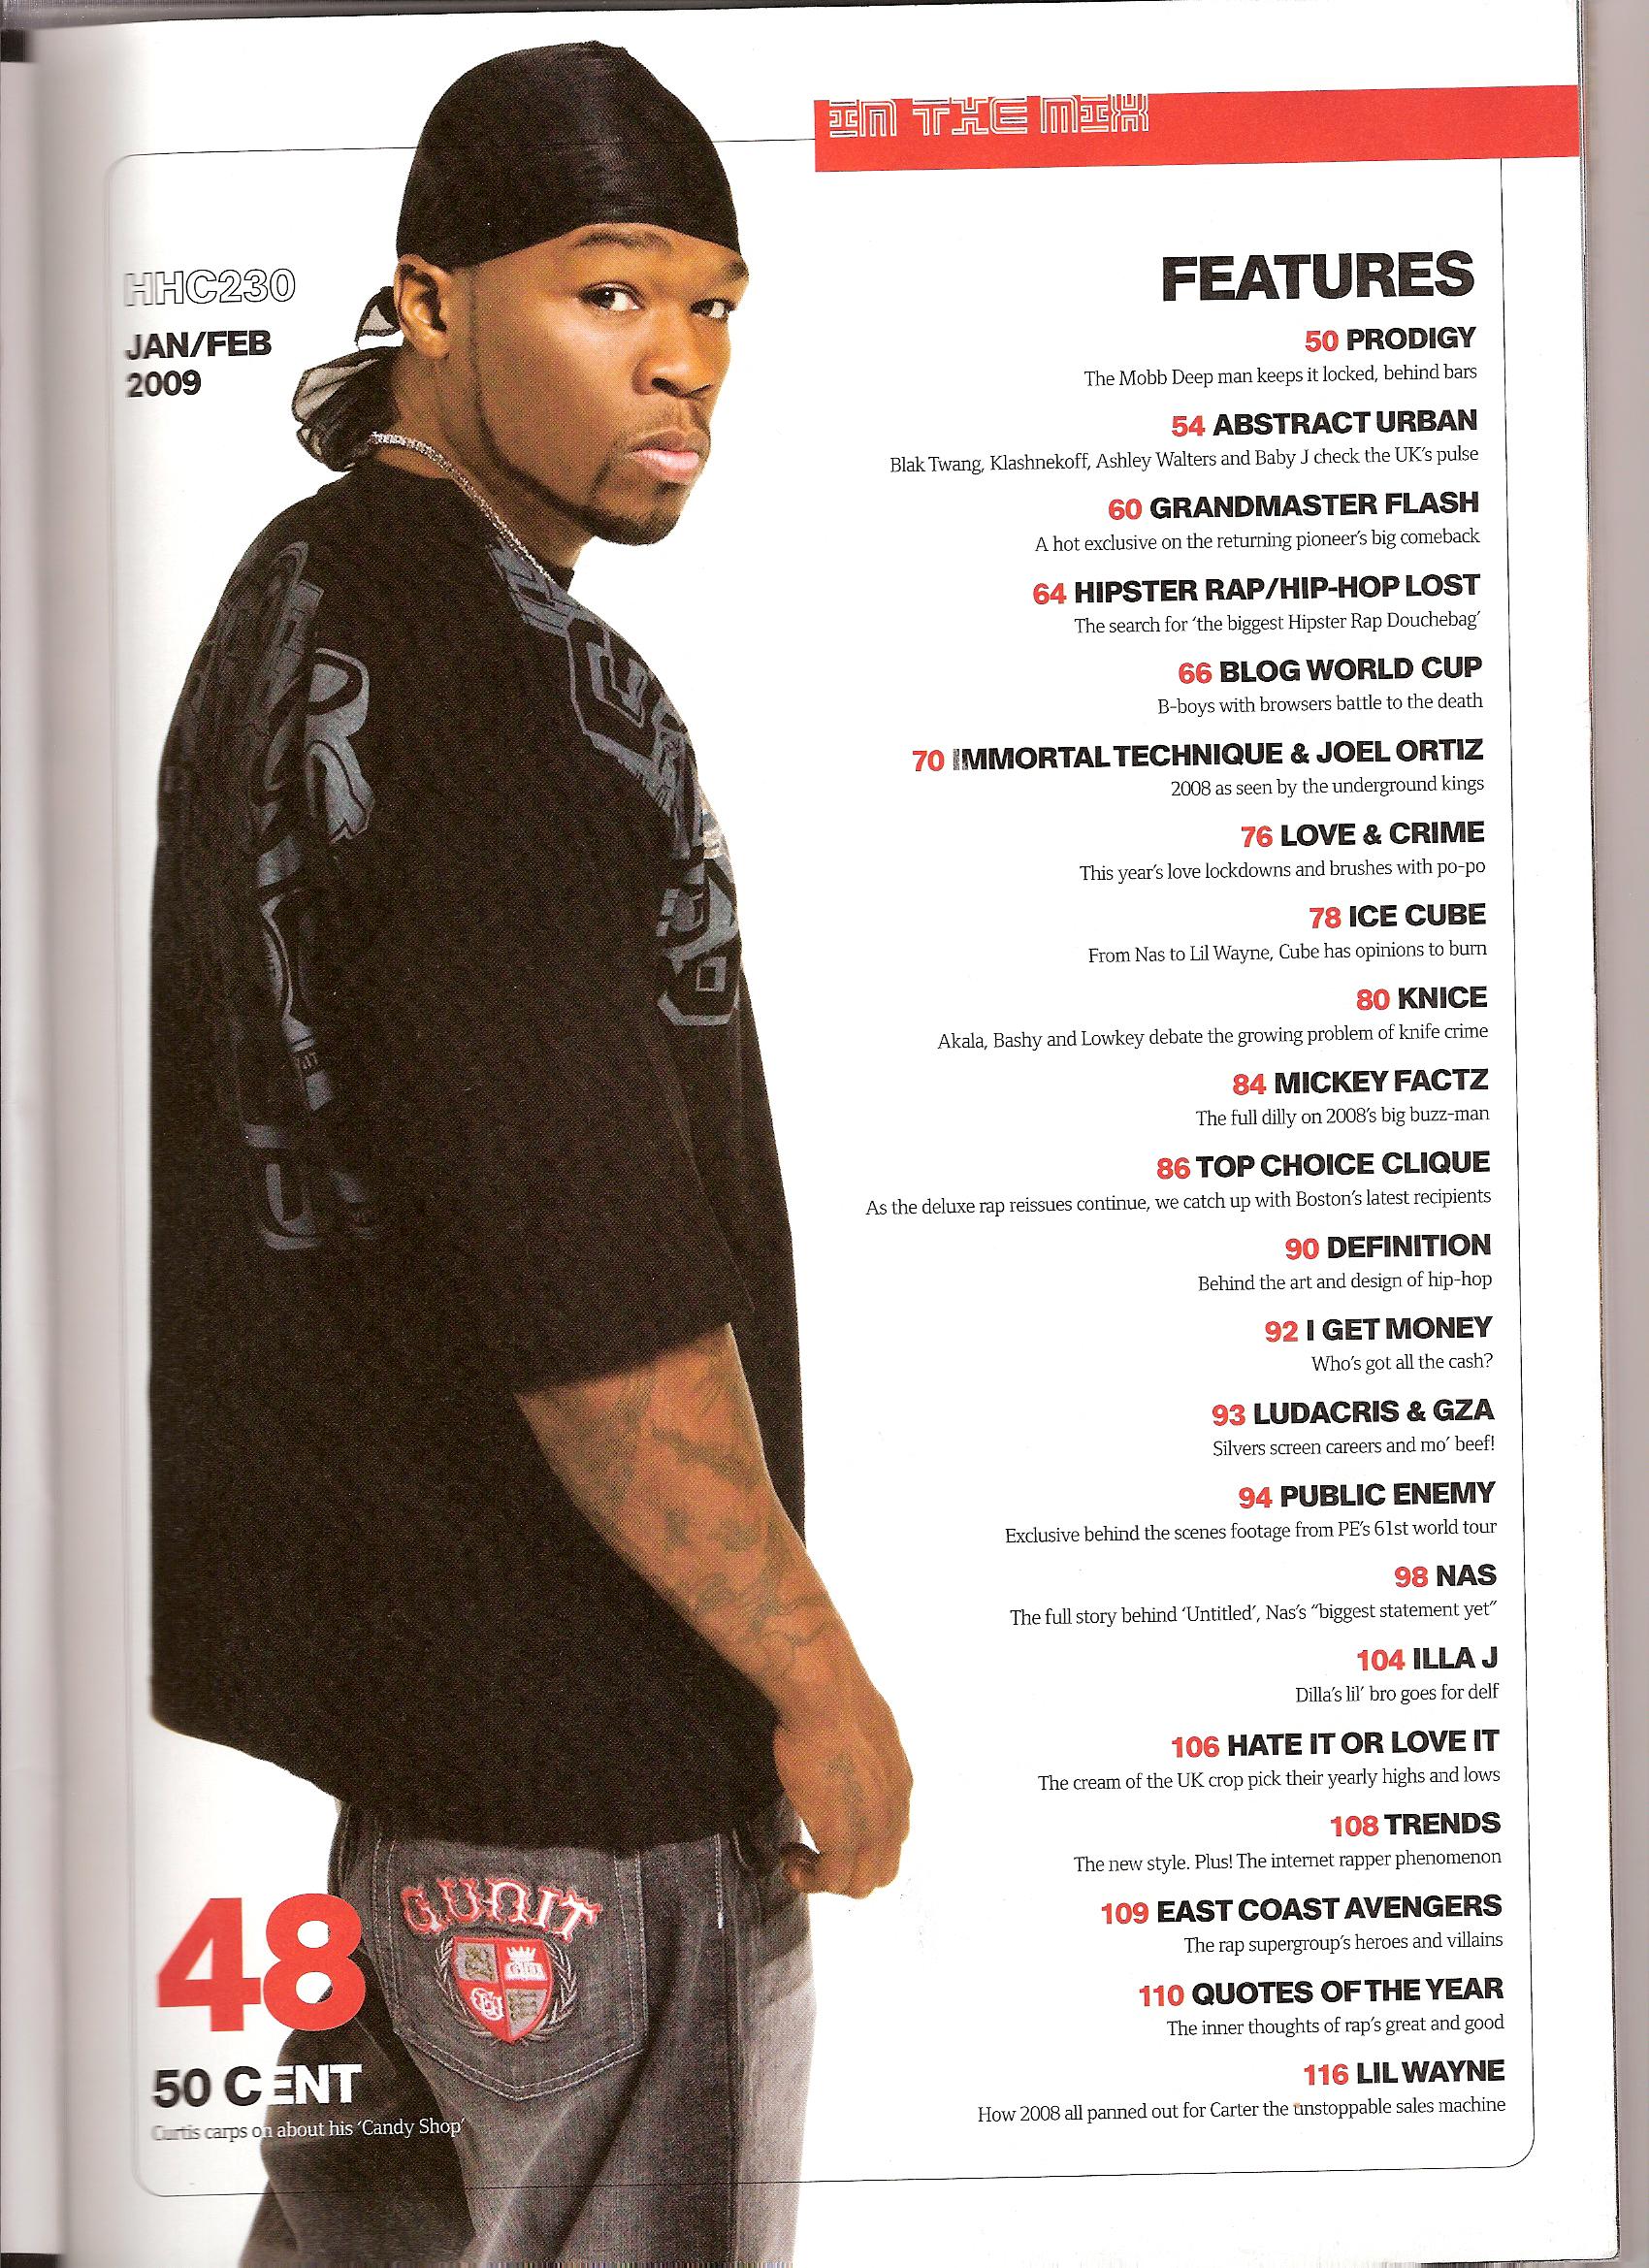 Contents In A Fashion Magazine